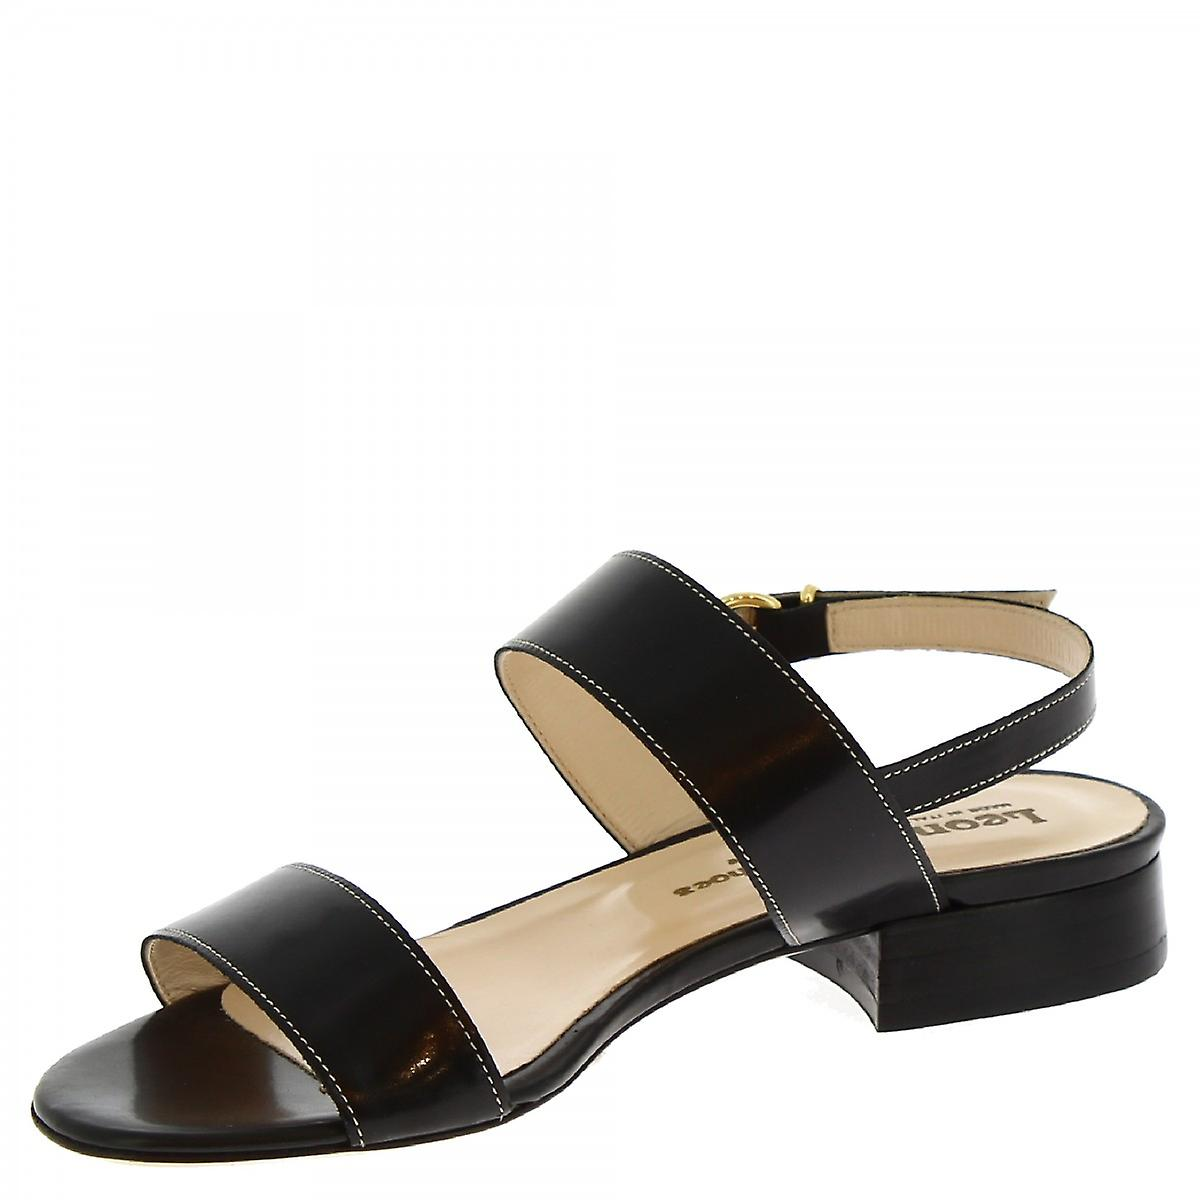 Leonardo Shoes Women's handmade low heels sandals black leather buckle closure